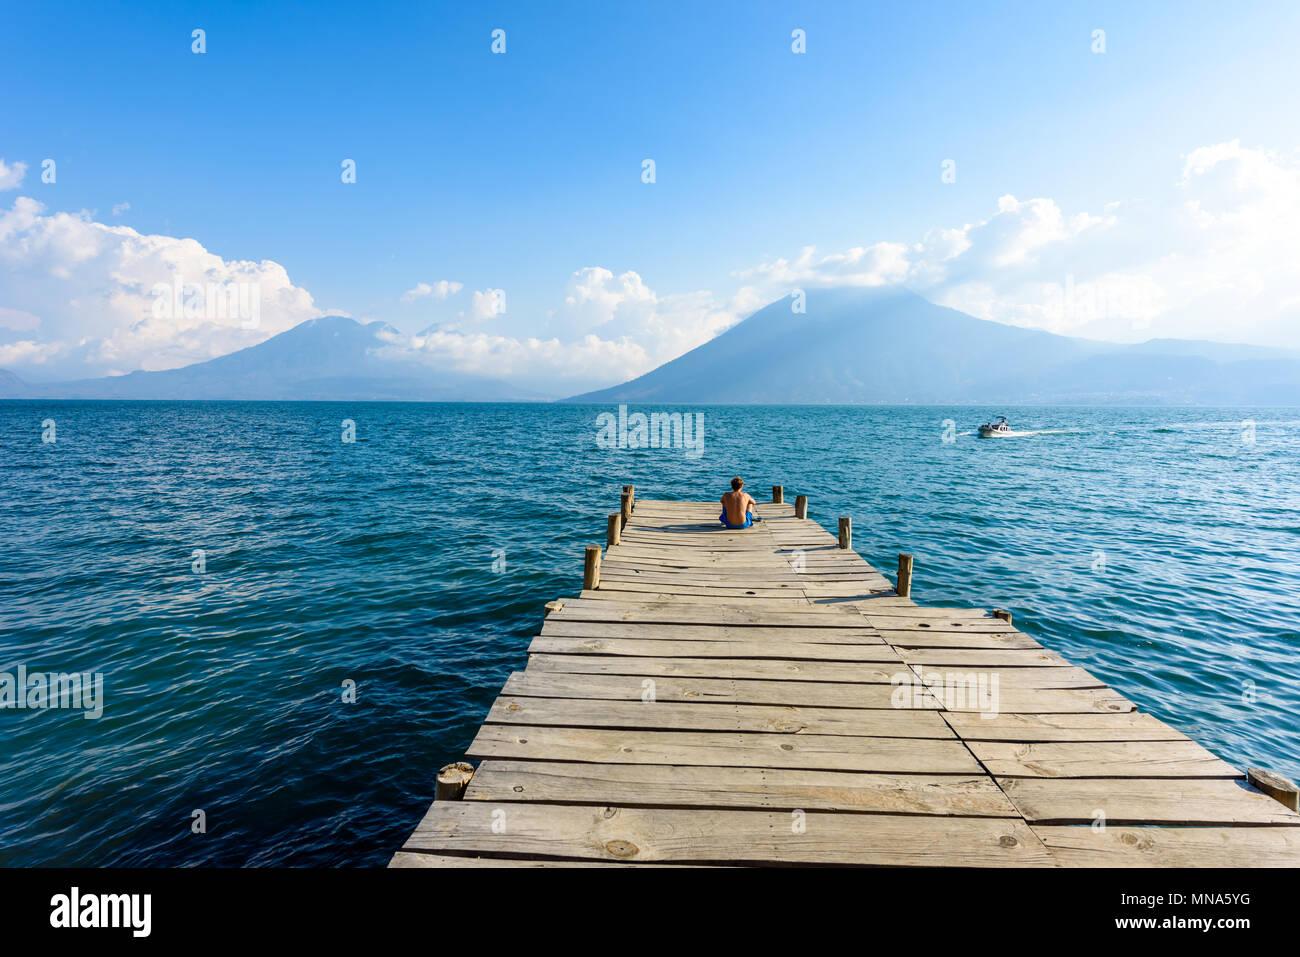 Pier at San Marcos La Laguna with beaufiful scenery of Lake Atitlan and volcanos - Guatemala - Stock Image